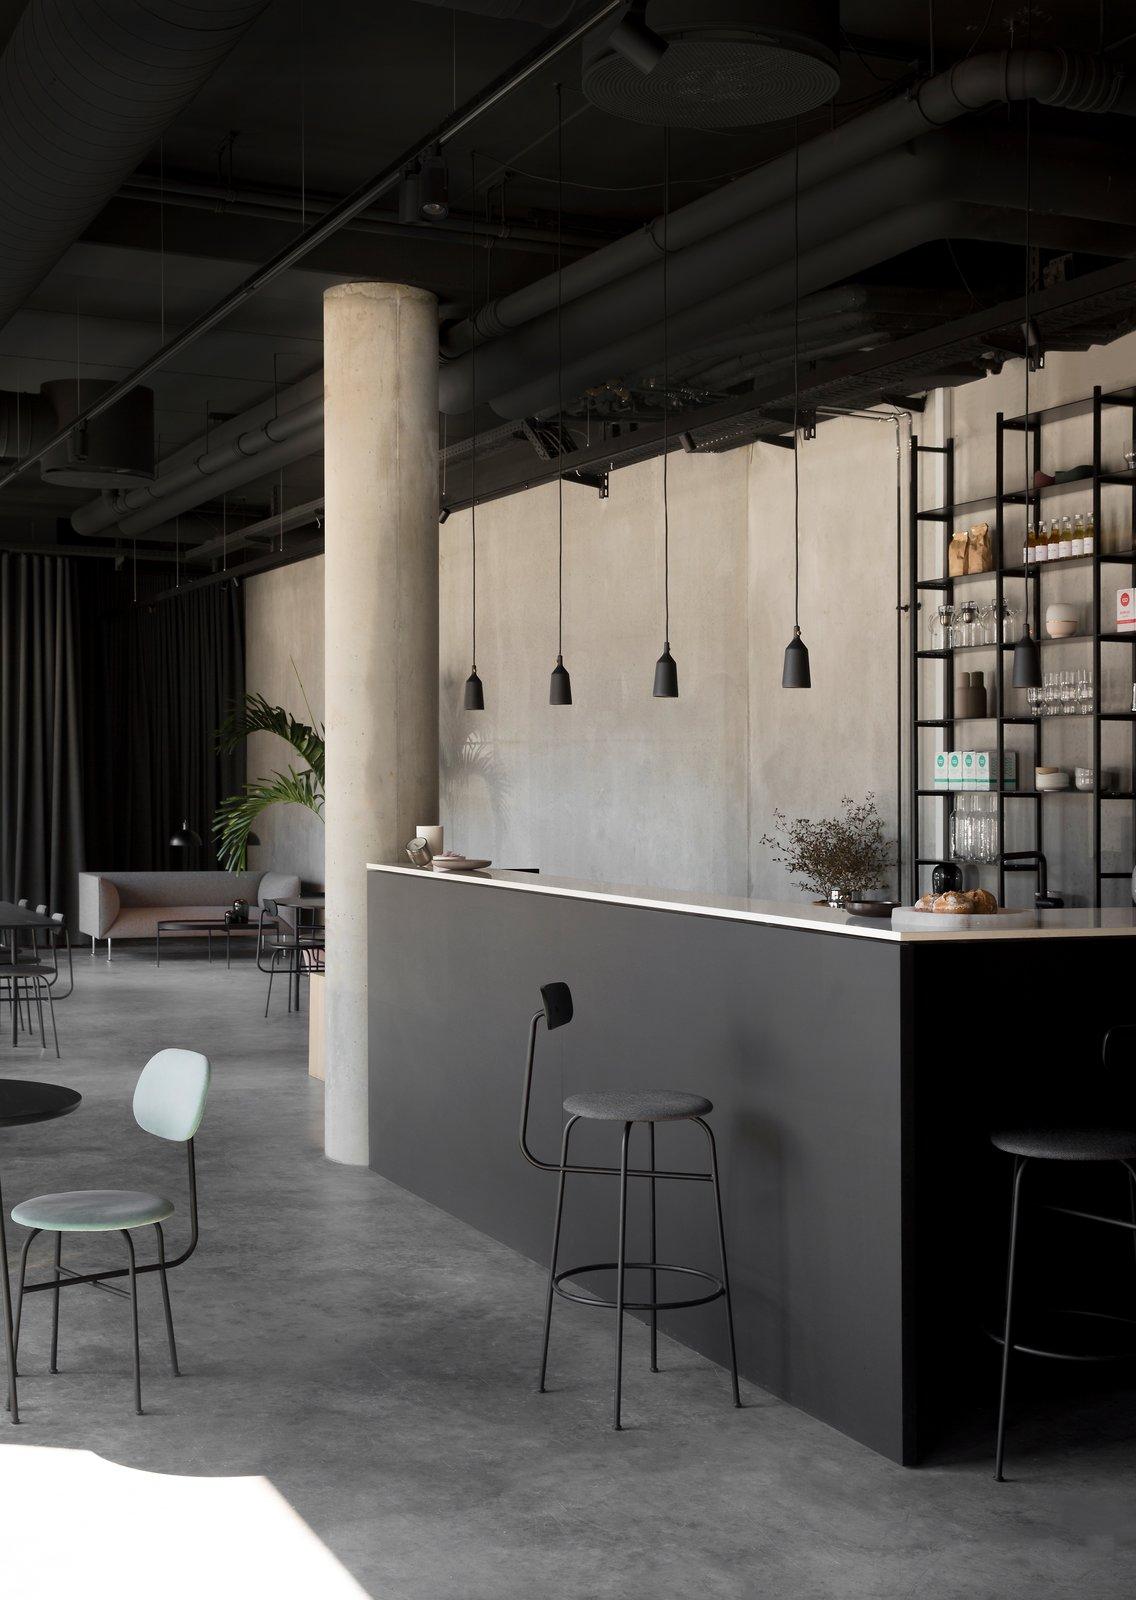 Photo 2 of 12 in Spotlight on Multidisciplinary Danish Design Studio, Norm Architects